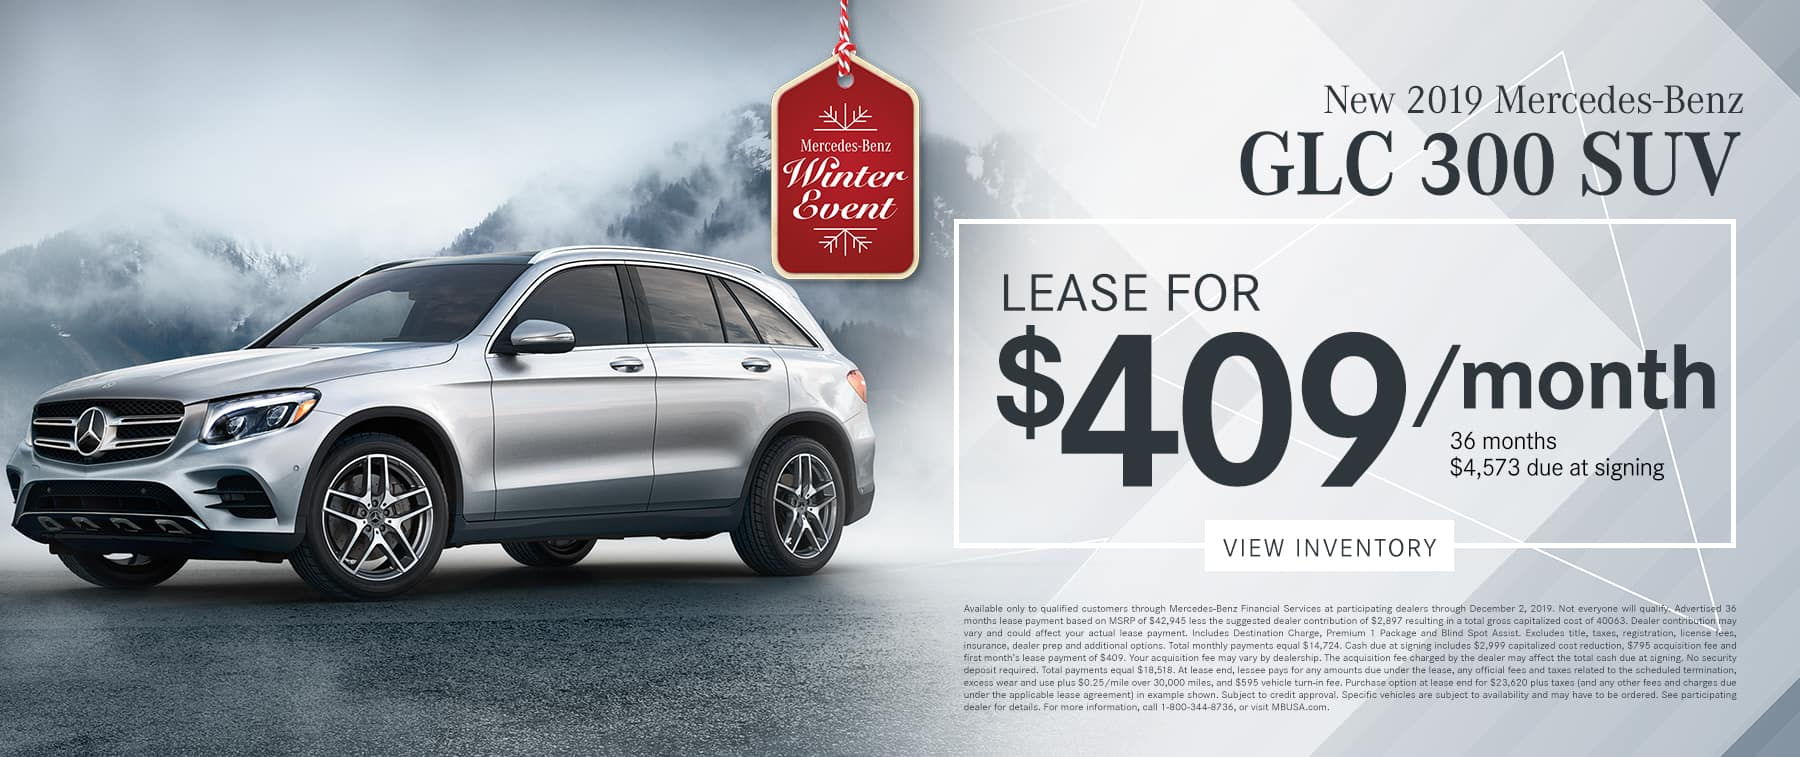 2019 GLC 300 LEASE FOR $409/MO.